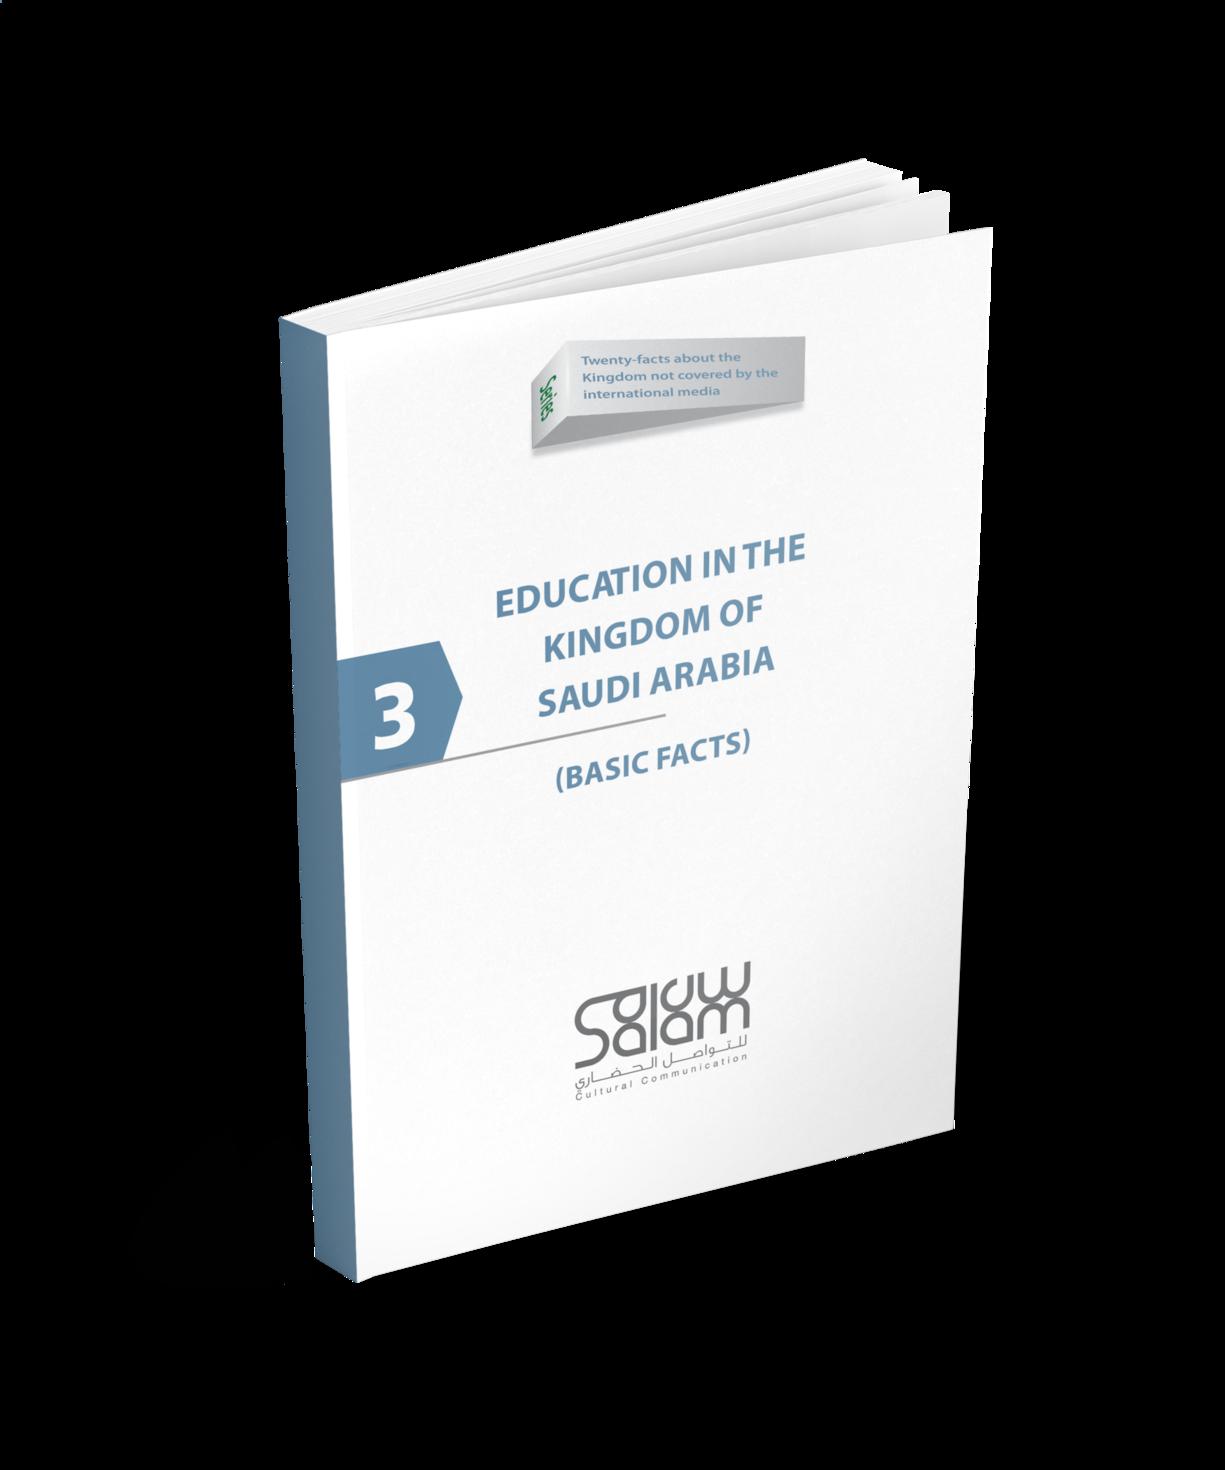 Education in the Kingdom of Saudi Arabia